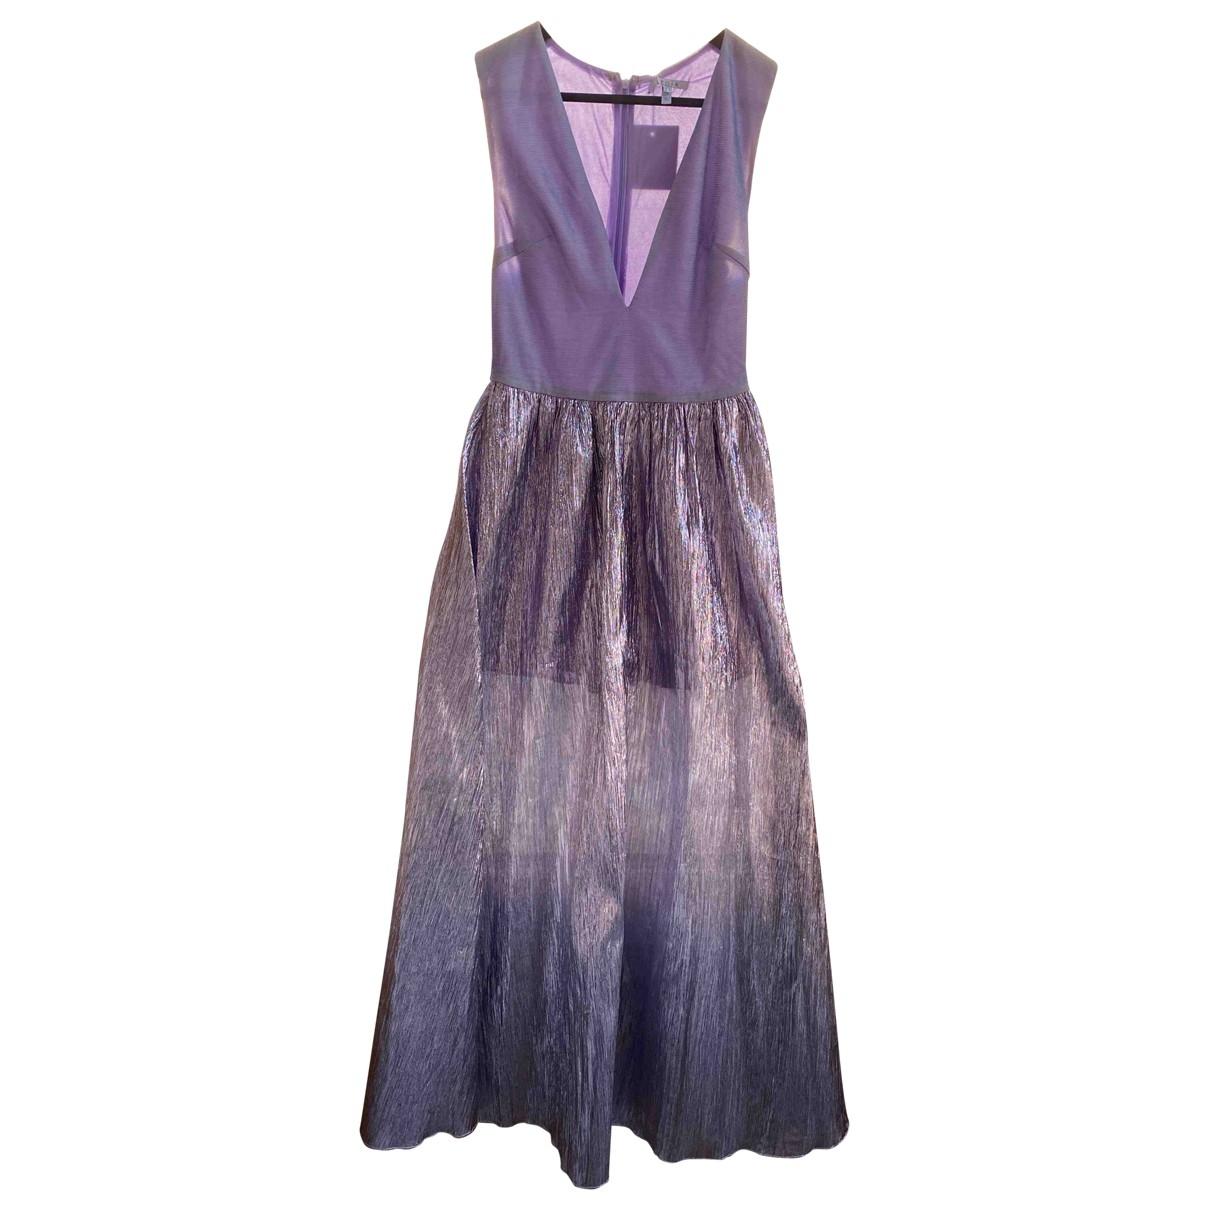 Atoir \N Purple dress for Women 8 UK